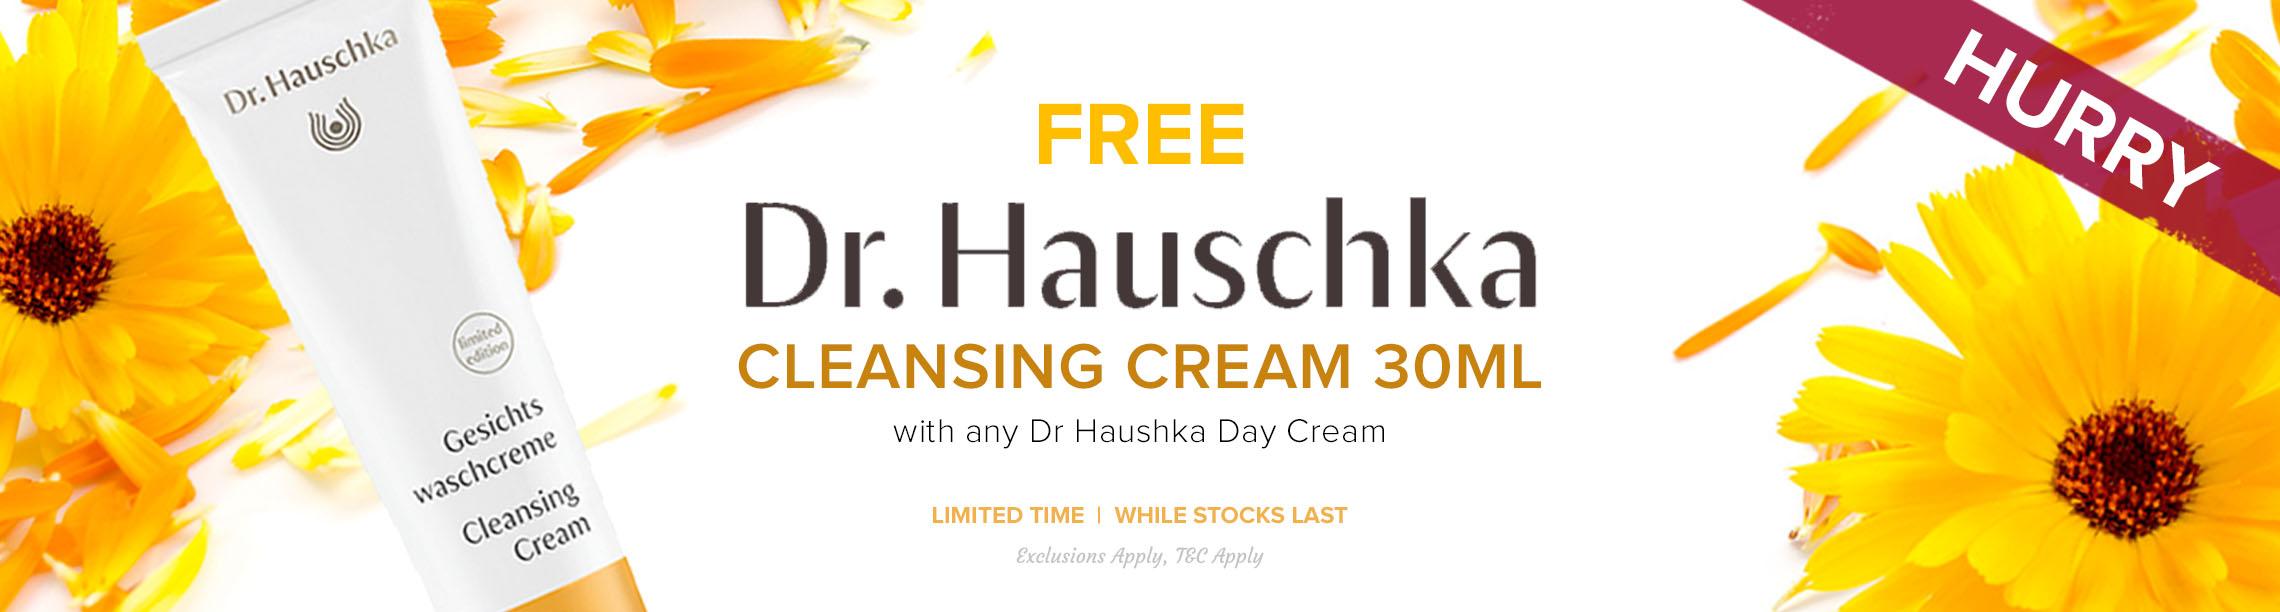 Free Dr Hauschka Cleansing Cream